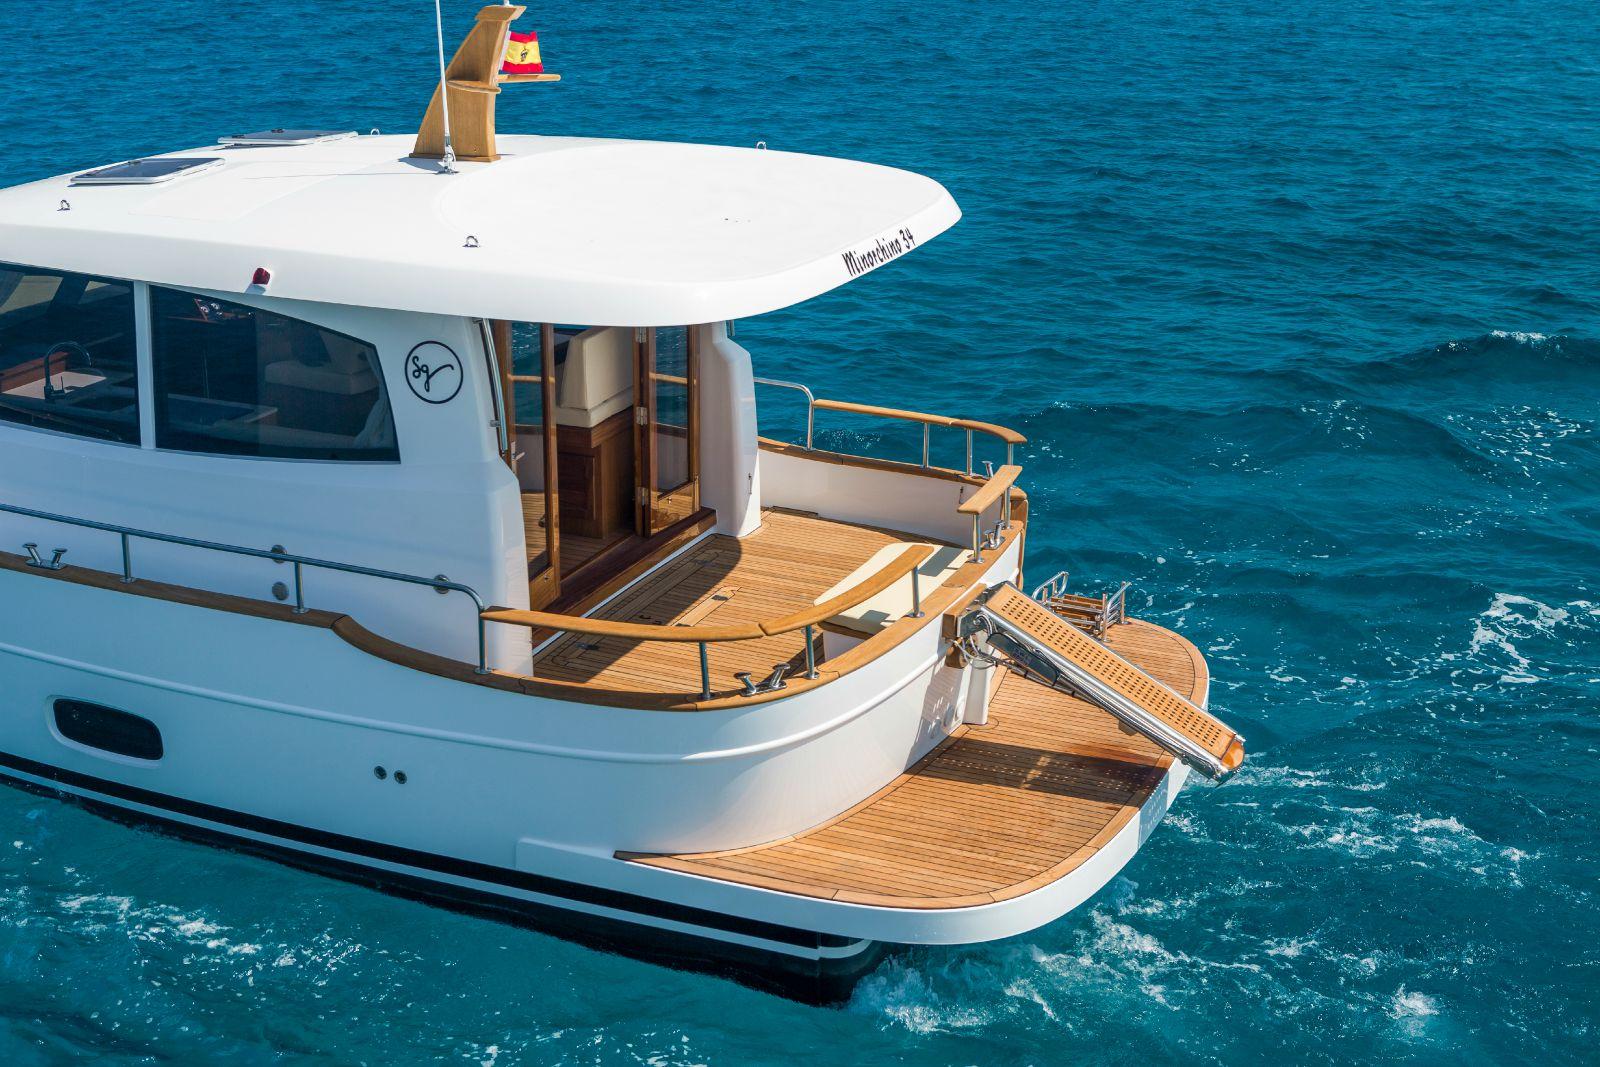 Minorca Islander 34 yacht for sale - Aft Deck